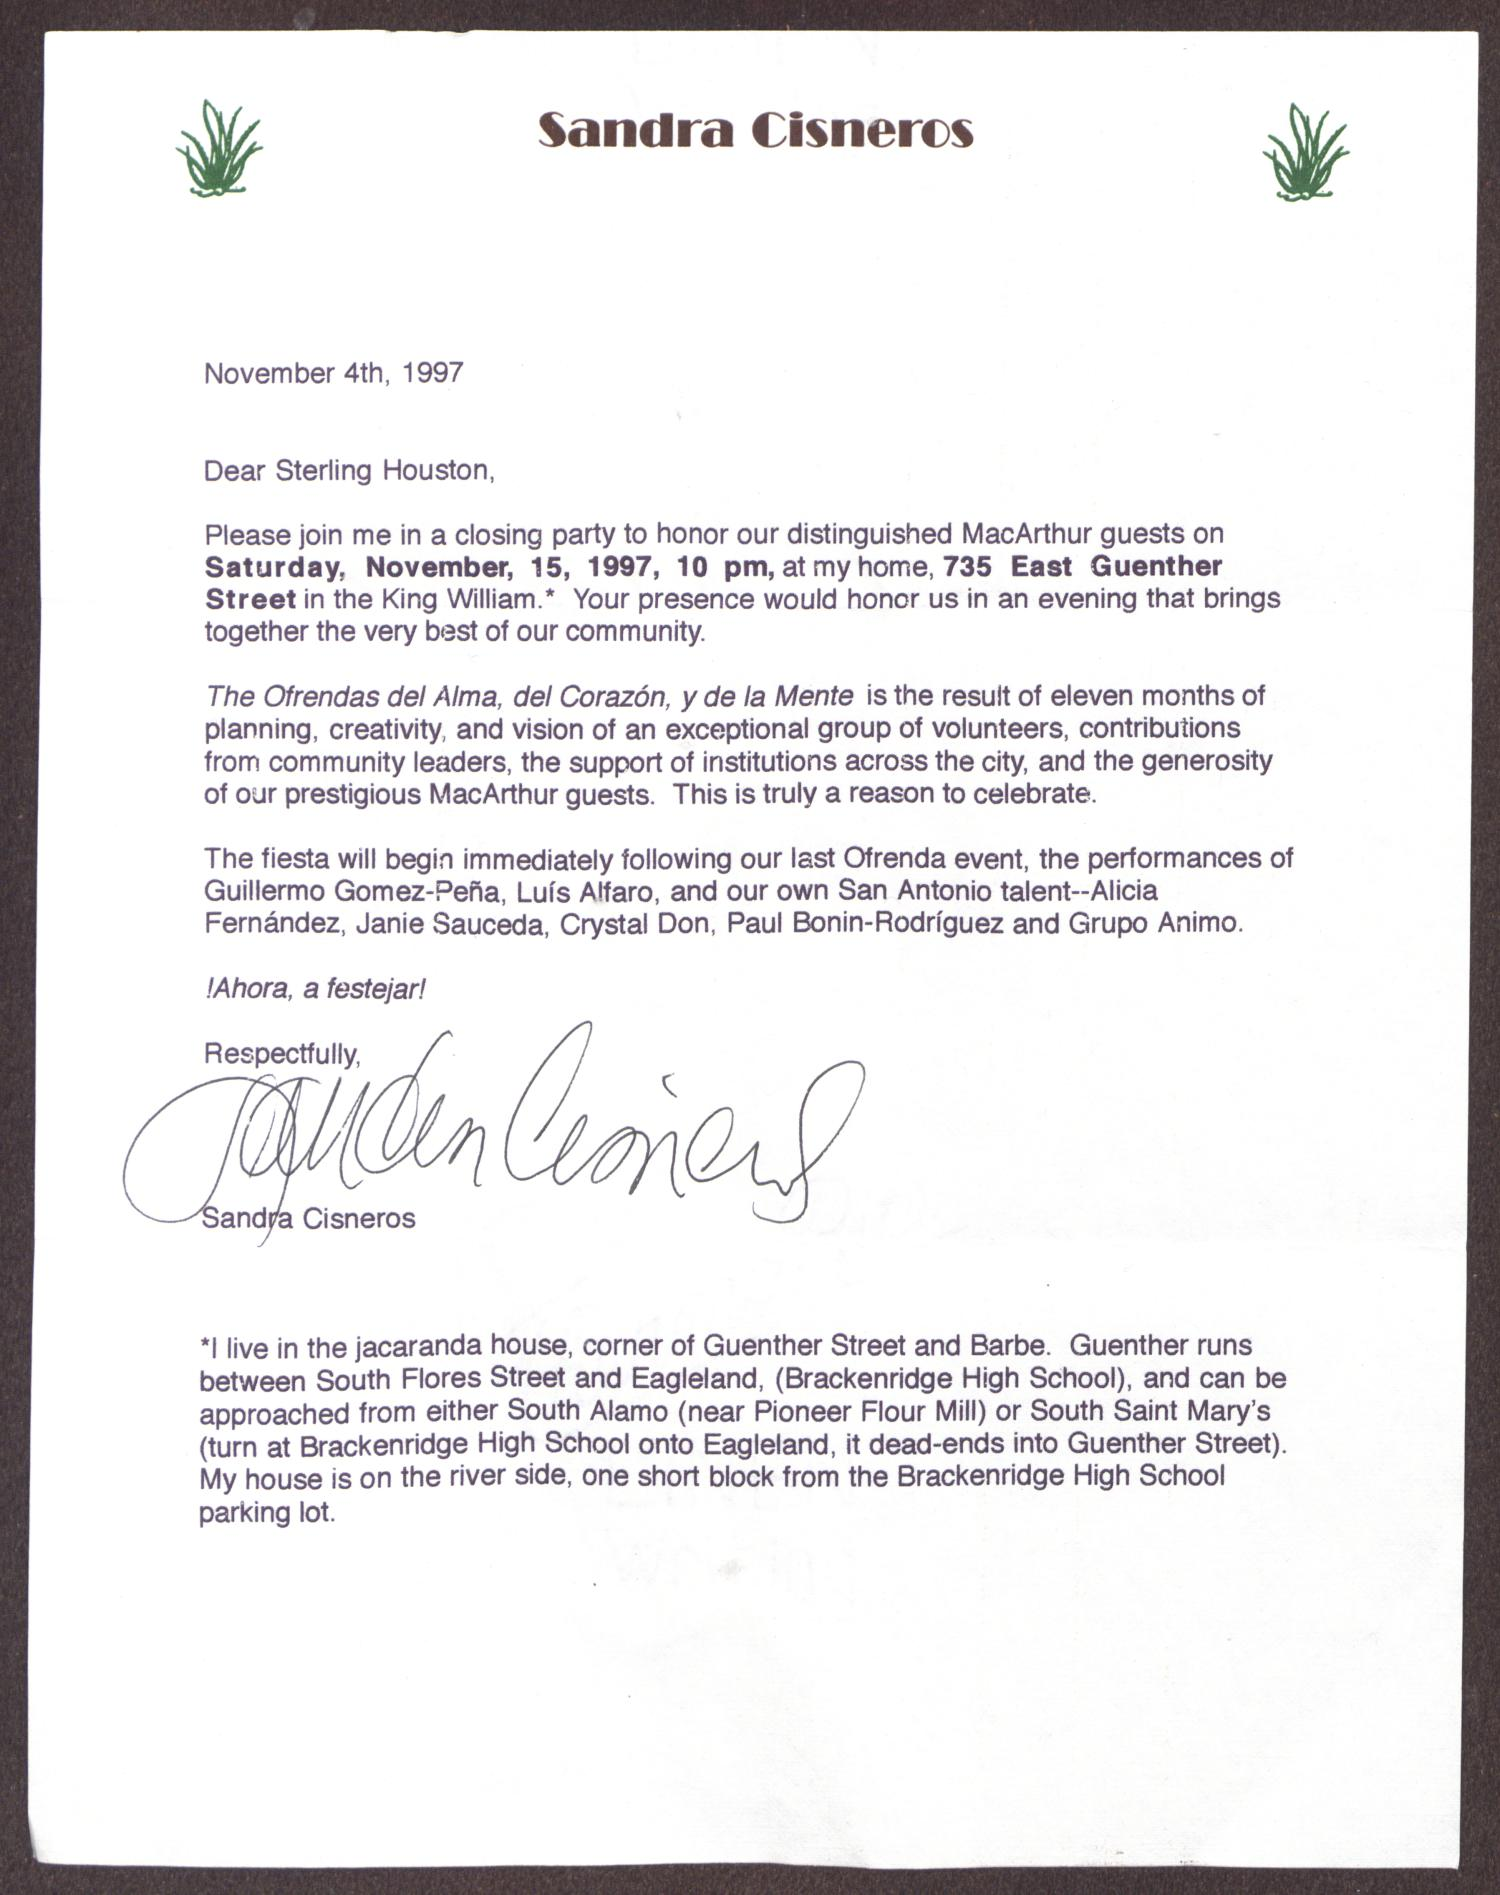 letter from sandra cisneros to sterling houston